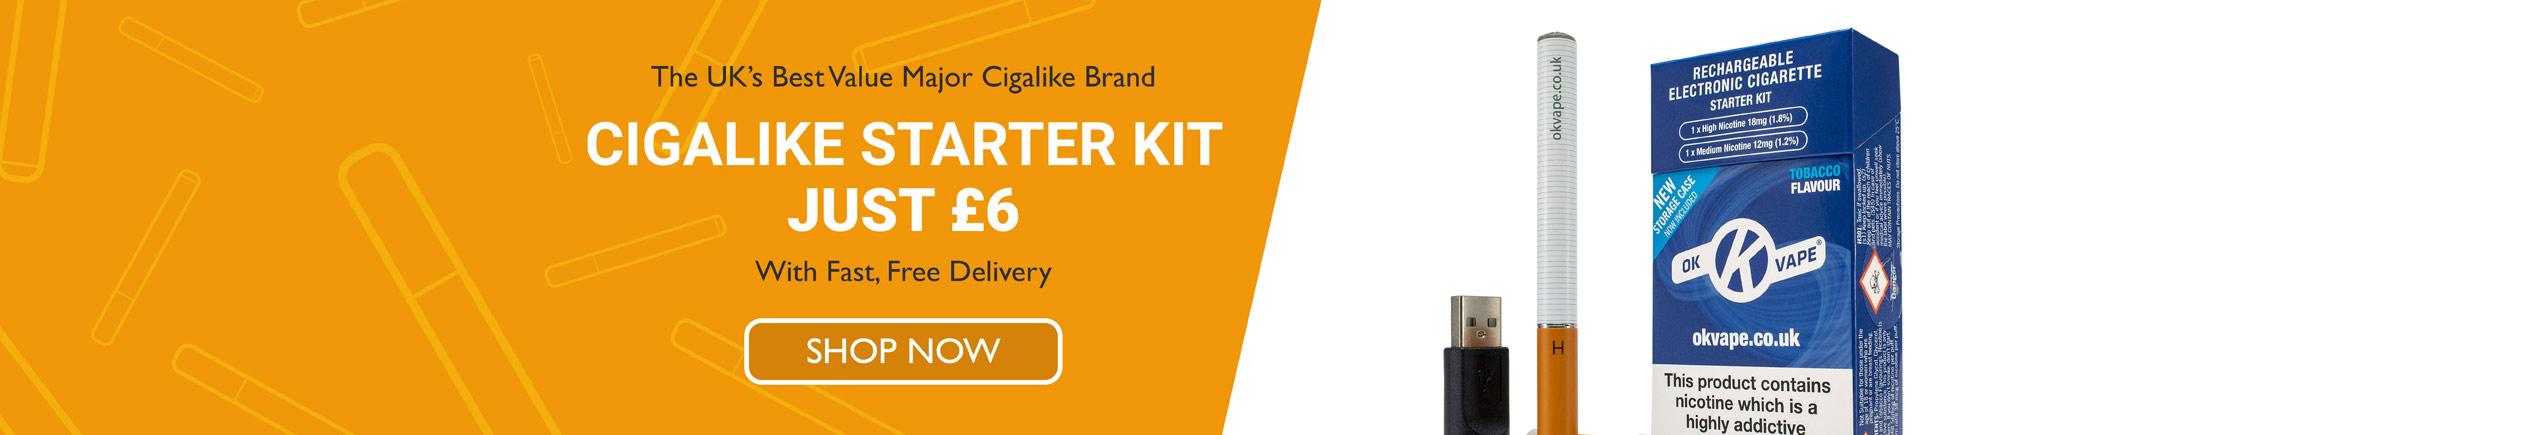 Homepage slider image - The UK's best major cigalike brand - Cigalike Starter Kit just £6 with fast free delivery